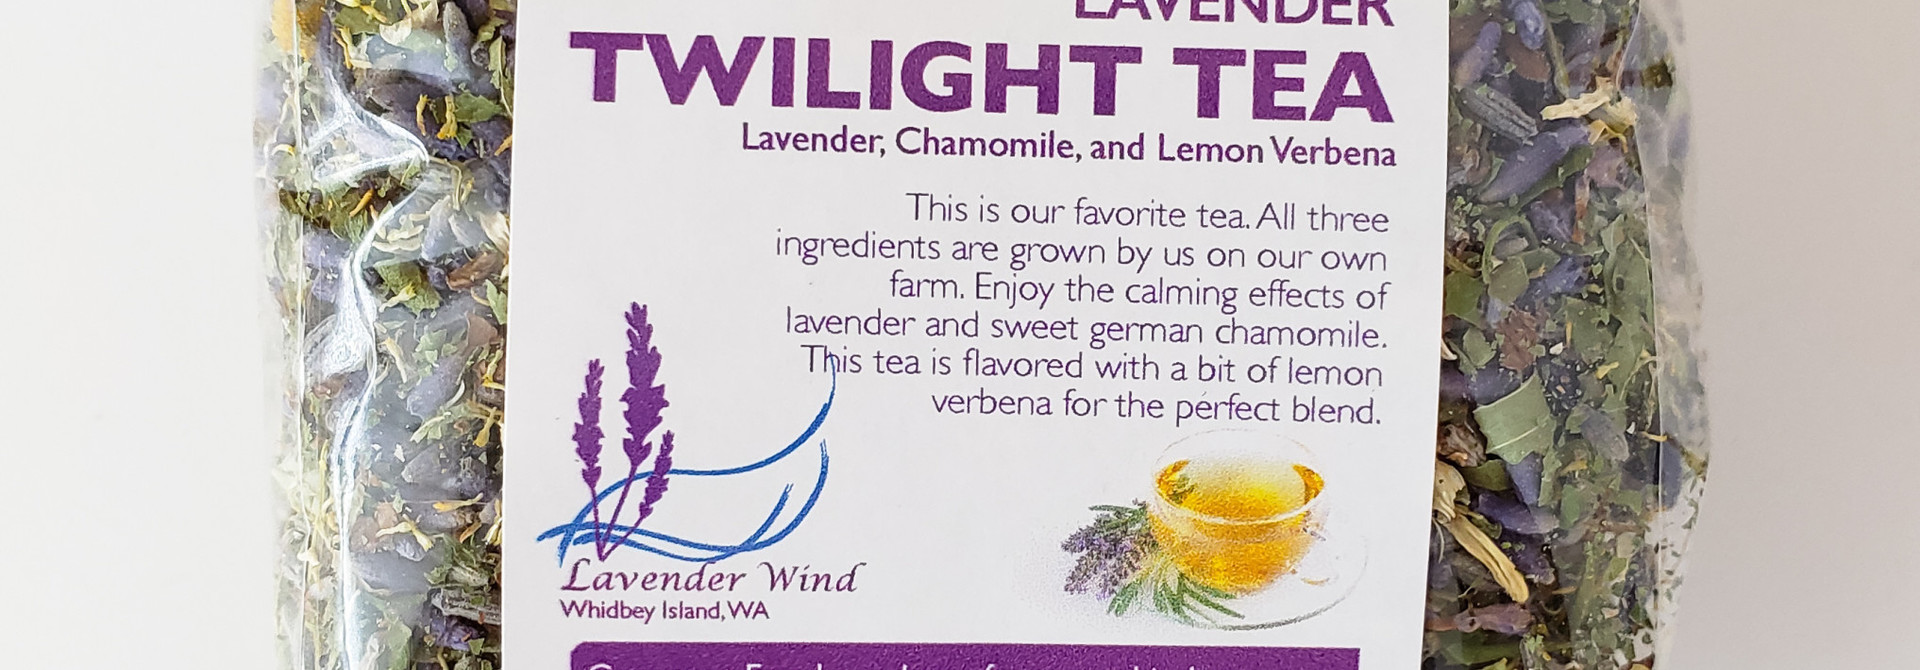 Lavender Twilight Tea - Bag 1.3 oz.